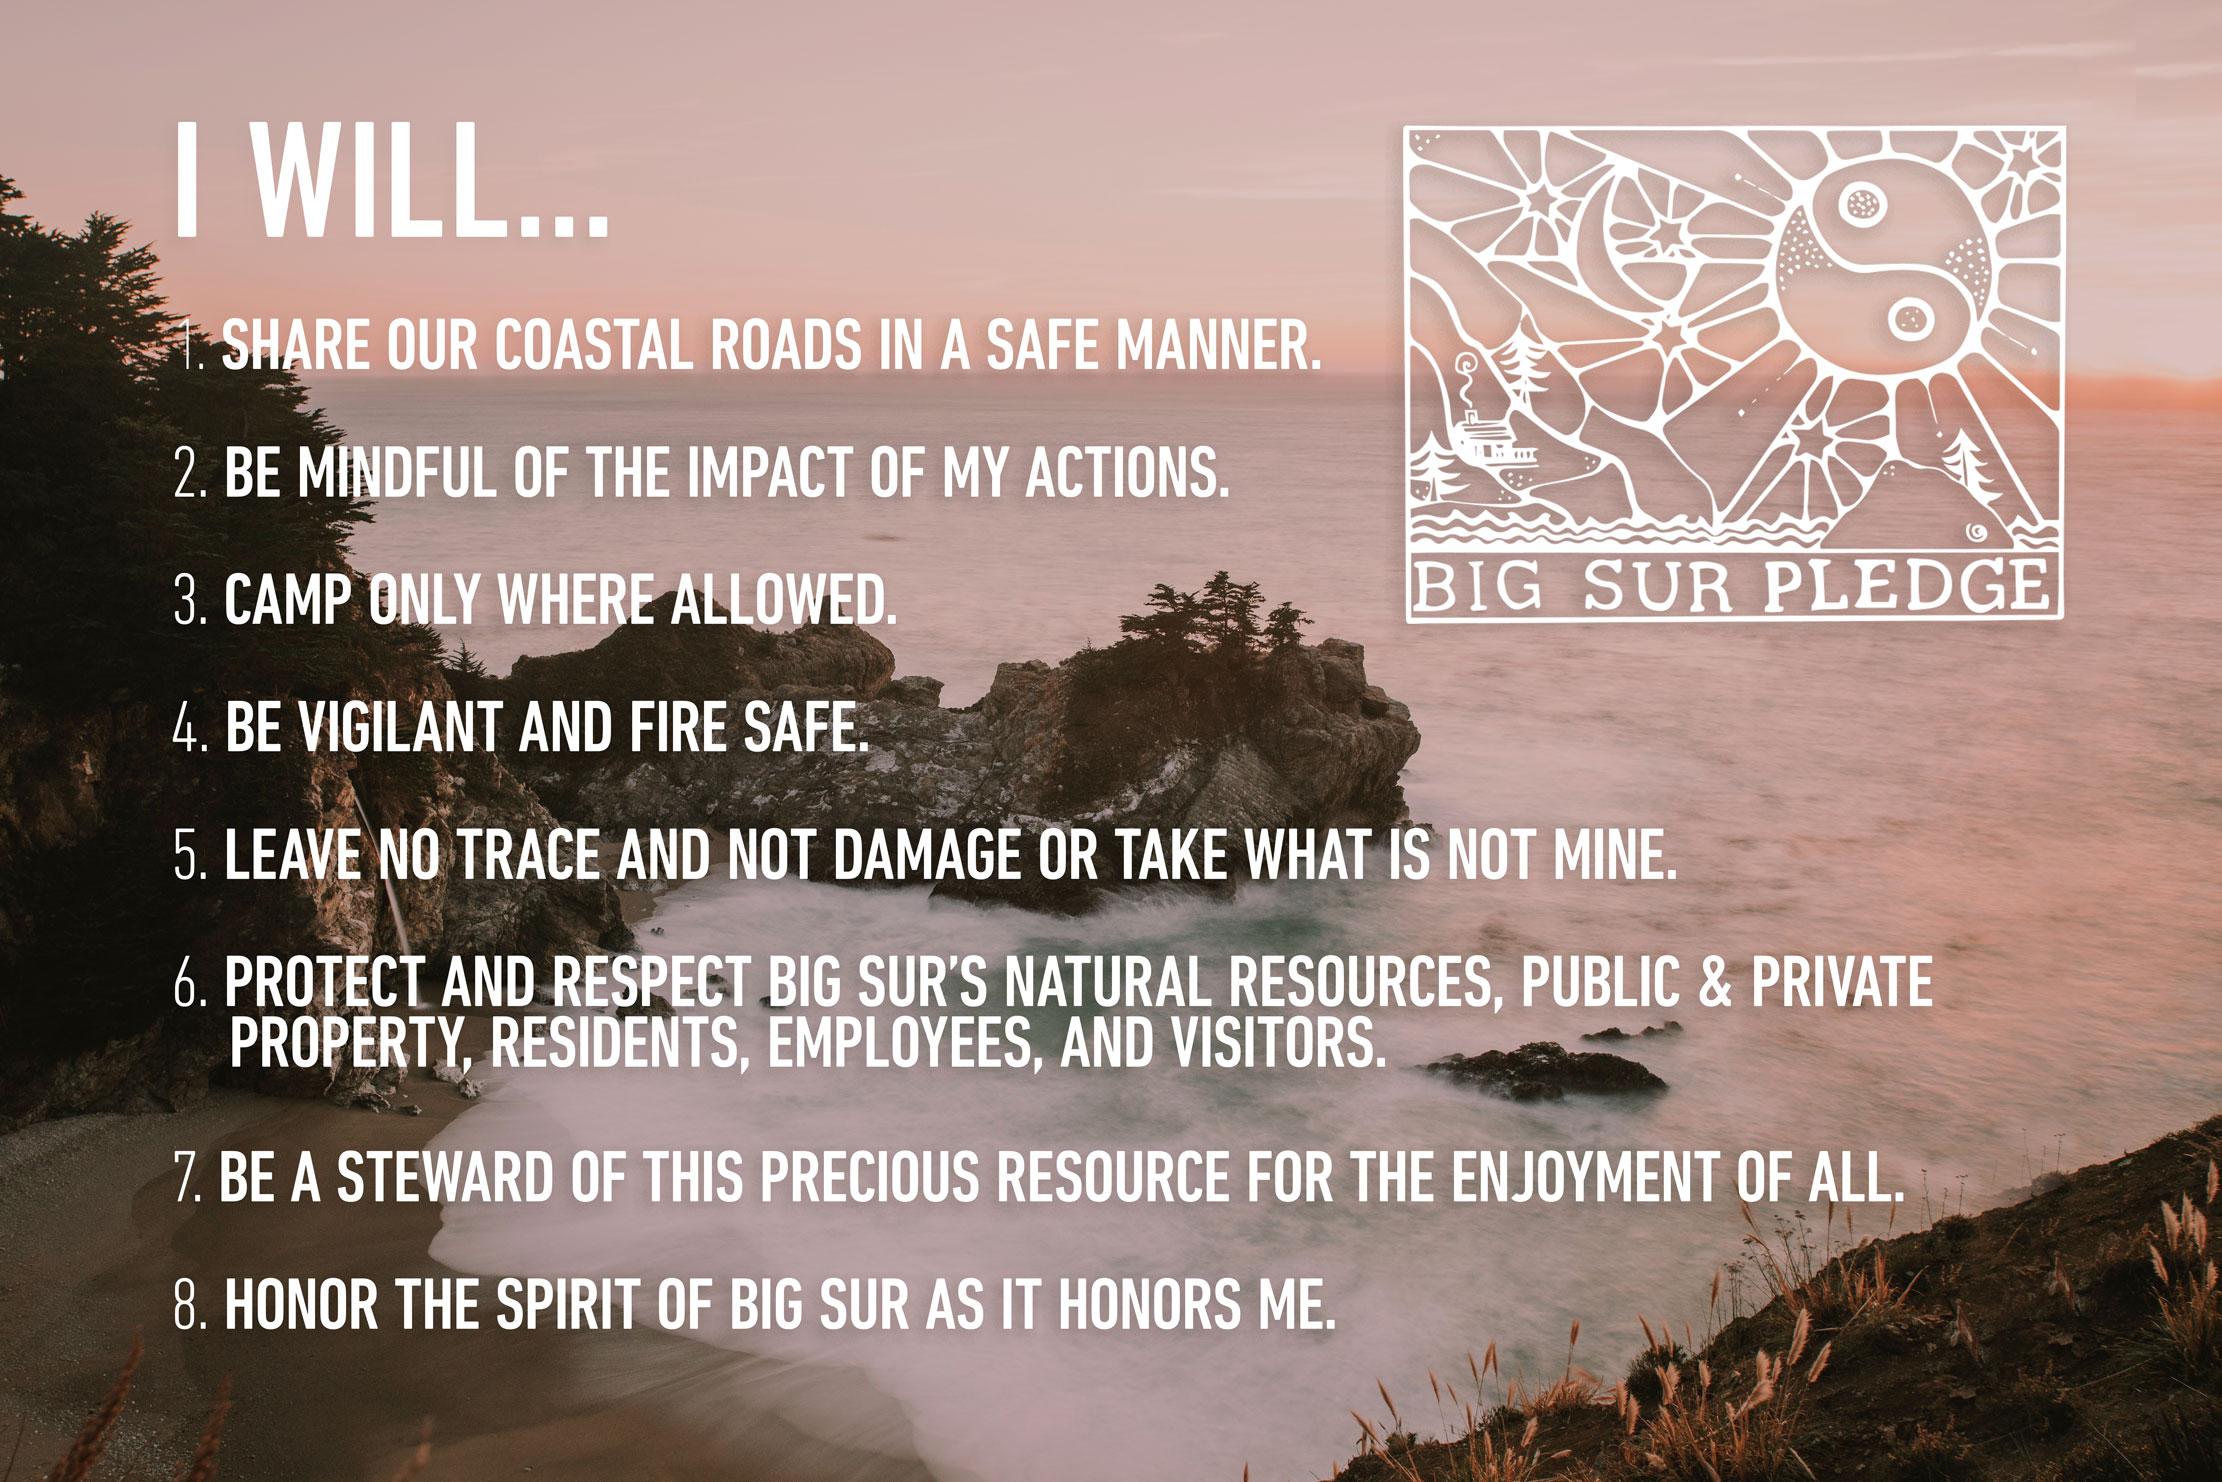 COMMUNITY - Please head to bigsurpledge.org and take the pledge